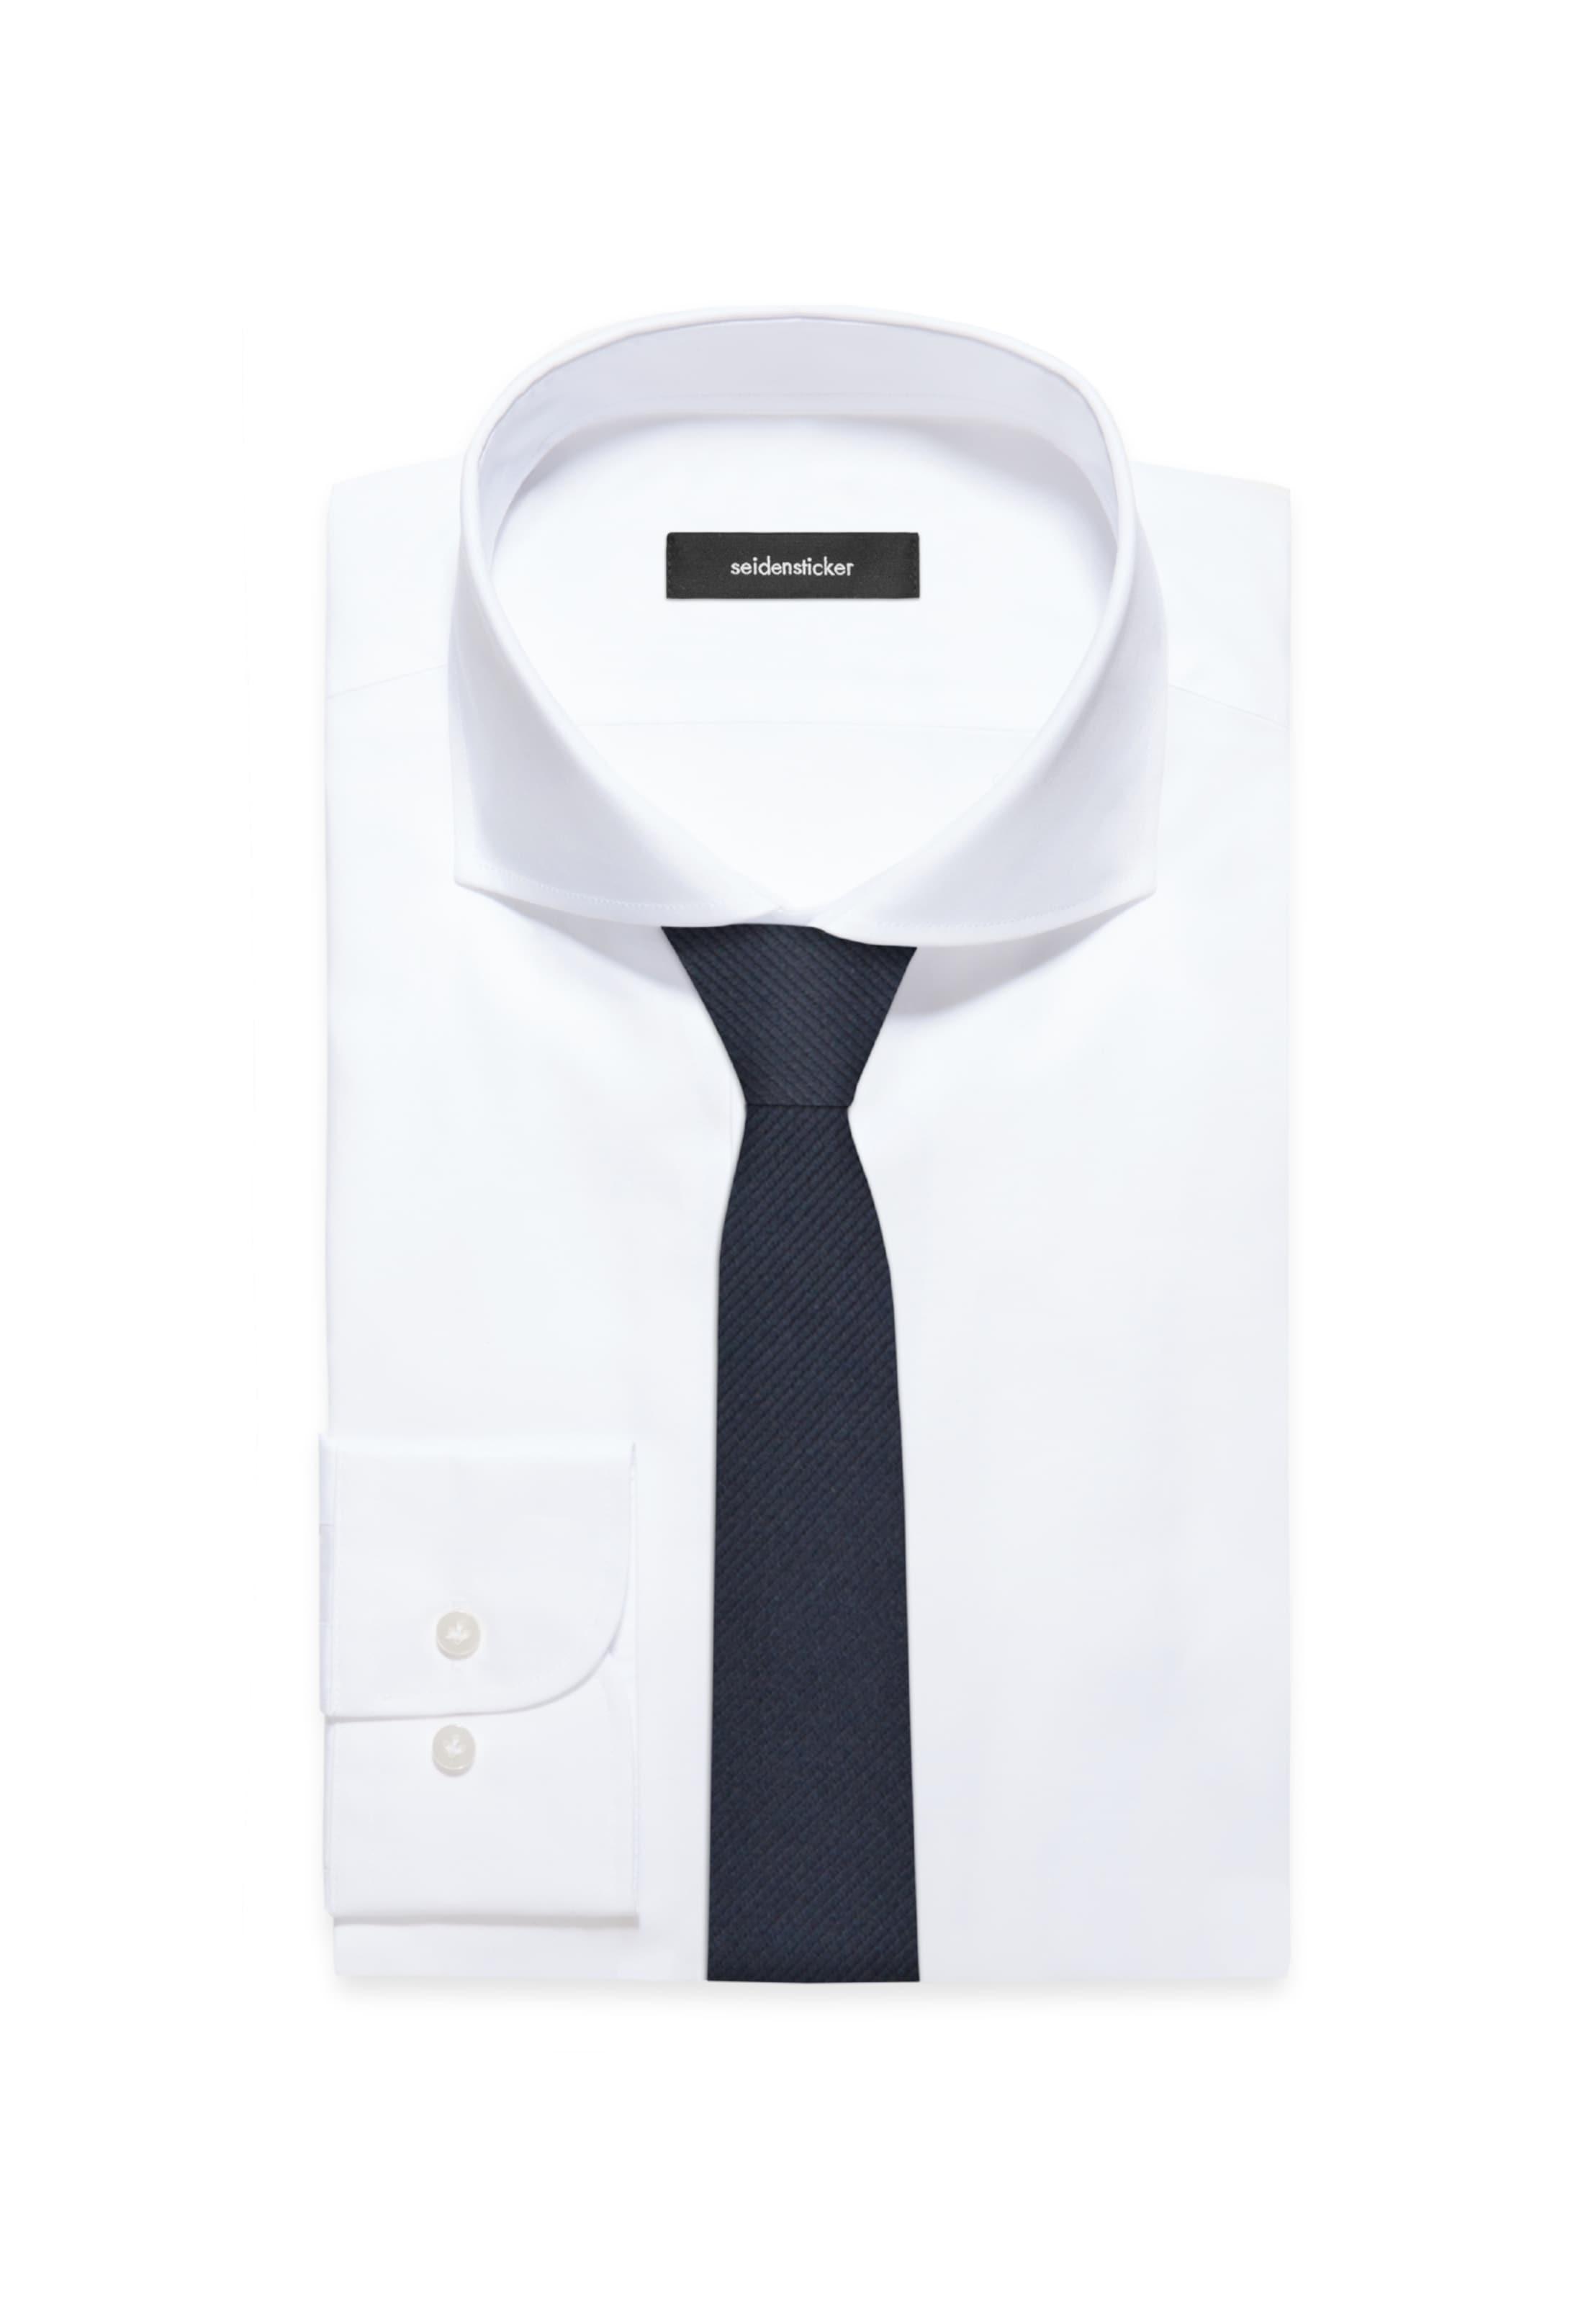 Seidensticker Cravate 'slim' Cravate Cravate En 'slim' Bleu 'slim' Seidensticker En Bleu Seidensticker shtrBxdCoQ